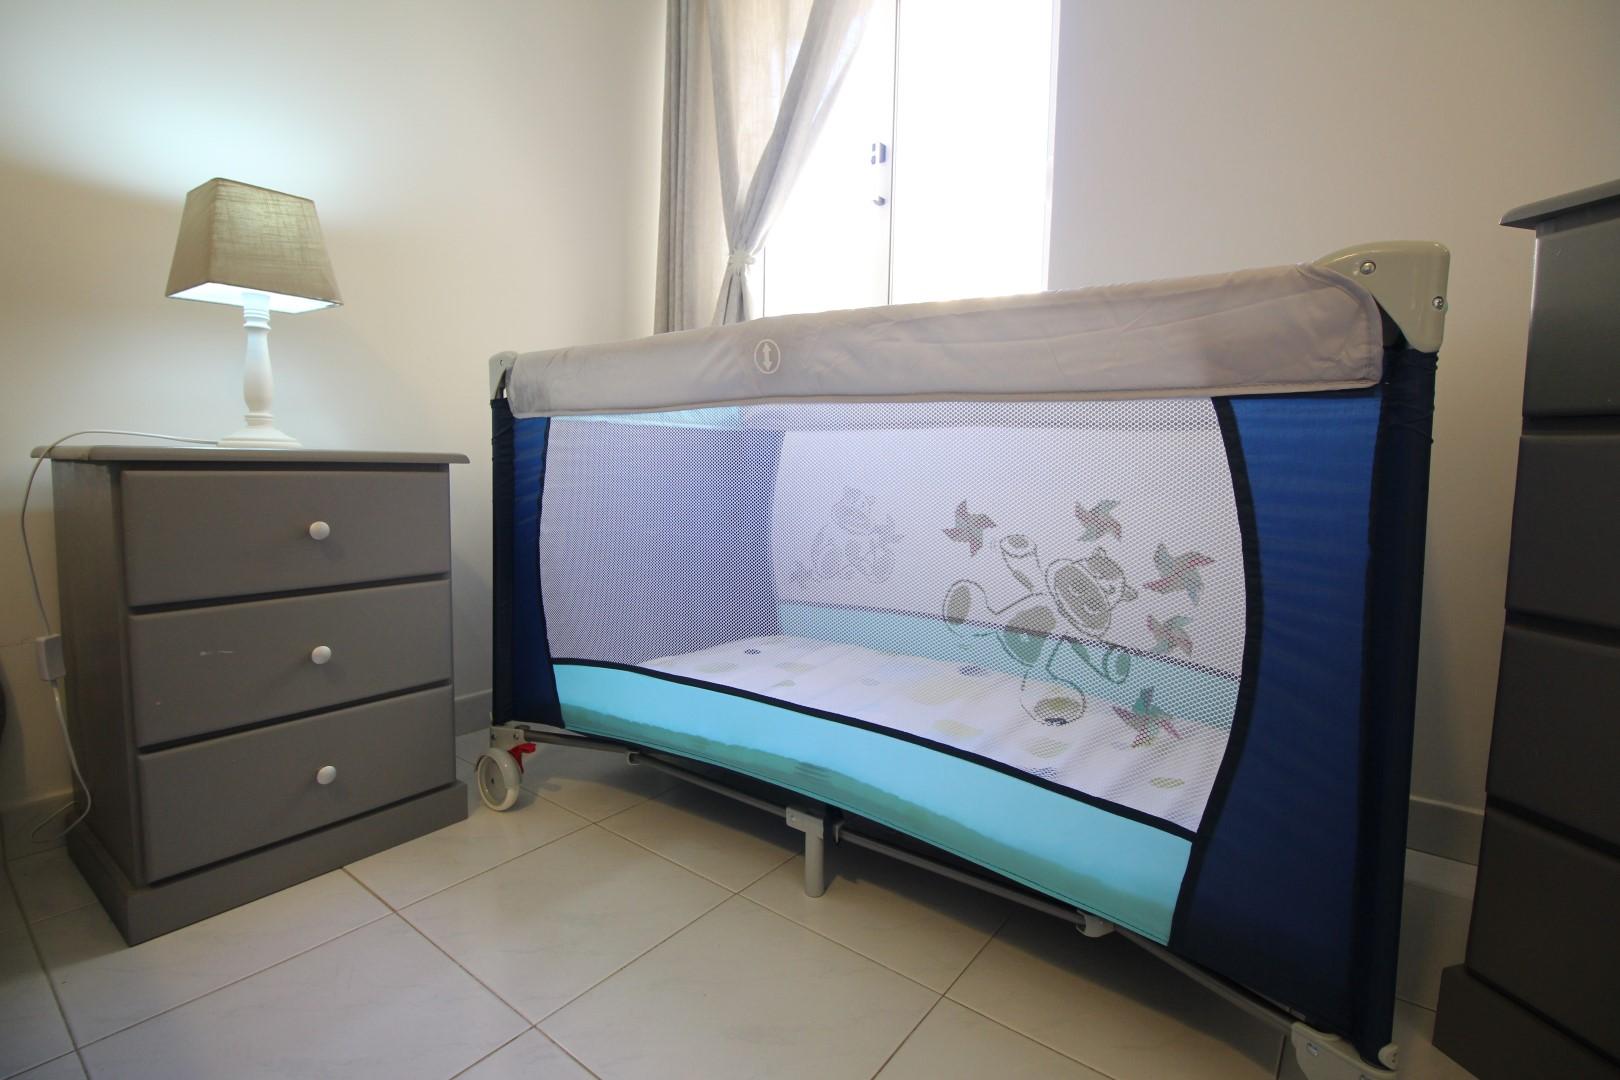 Location appartements et villas de vacance, Appartement en face de la plage – Armação-de-Pêra à Armação de Pêra, Portugal Algarve, REF_IMG_6809_8736